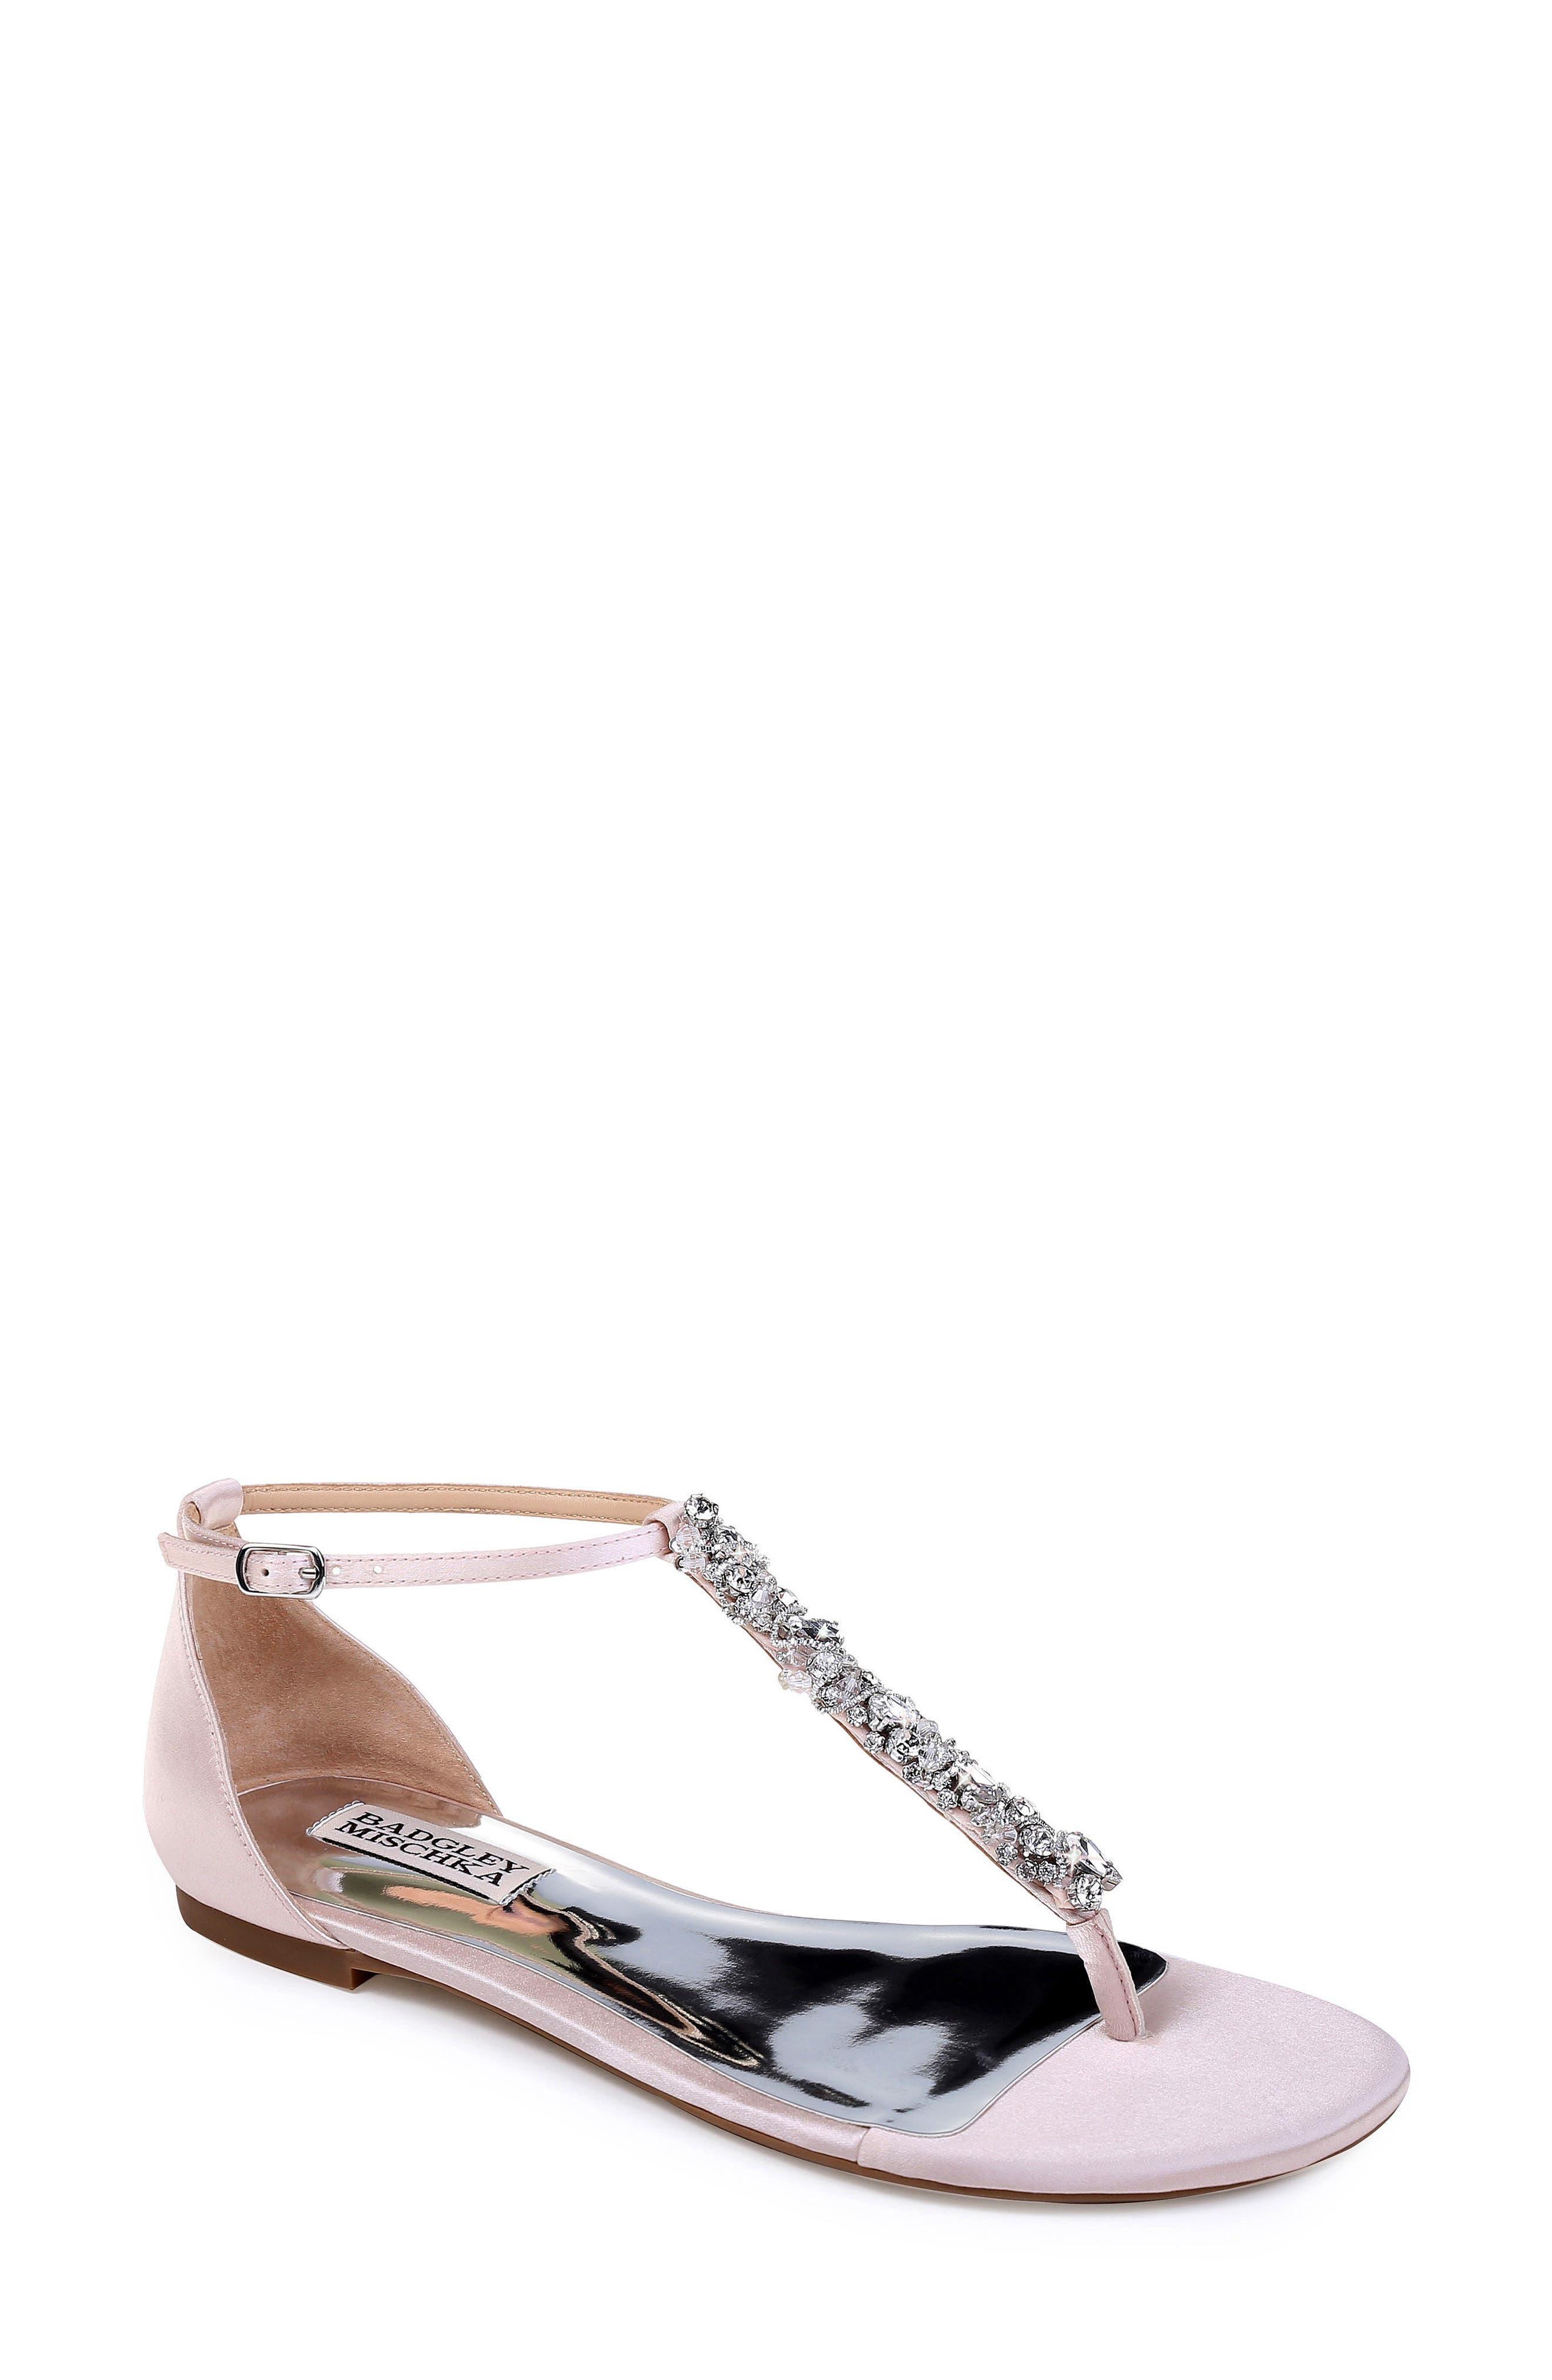 Alternate Image 1 Selected - Badgley Mischka Holbrook T-Strap Sandal (Women)